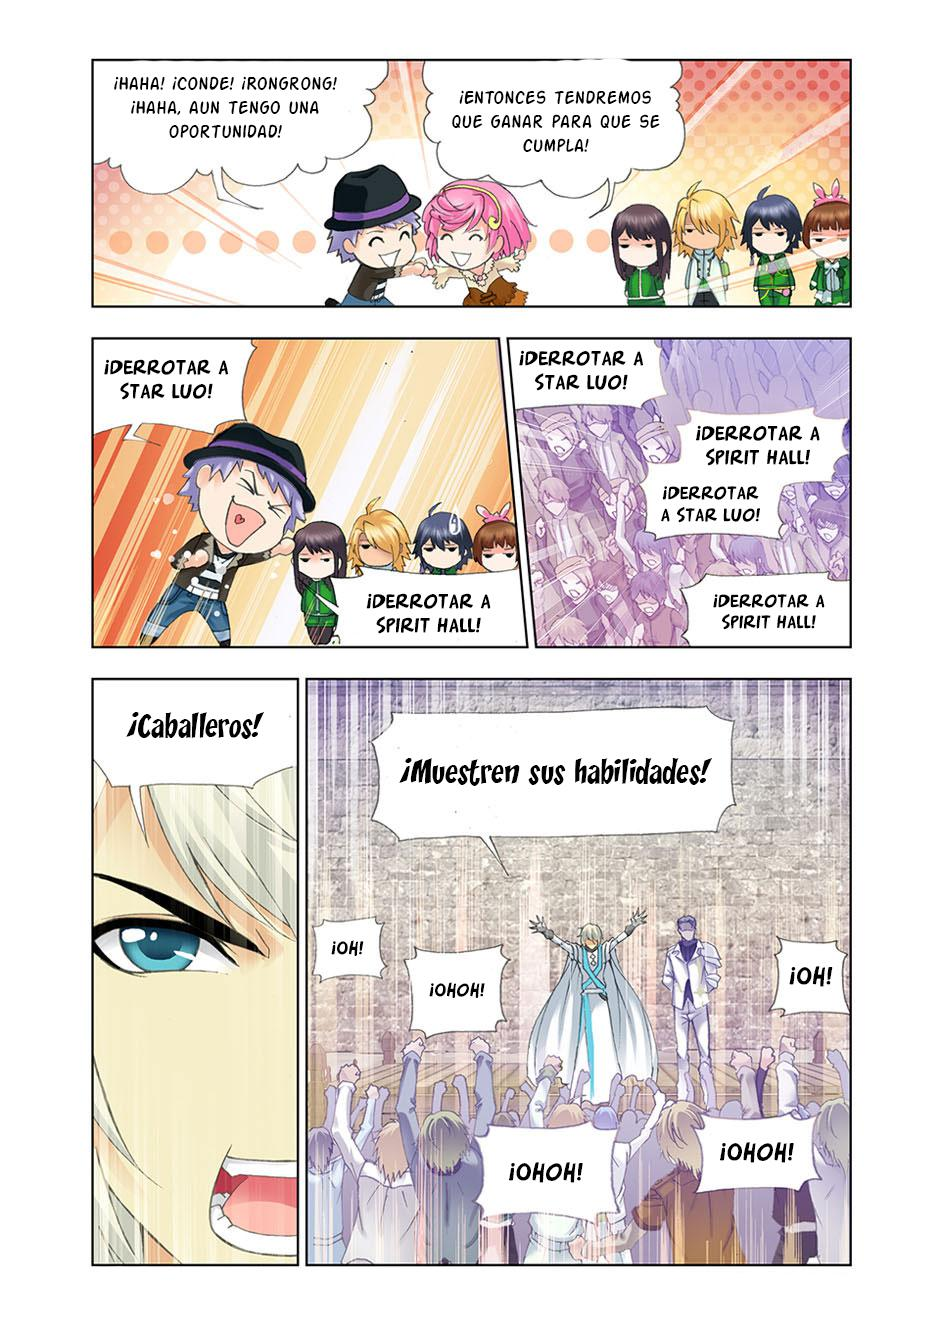 http://c5.ninemanga.com/es_manga/18/16210/417007/9d87746cec08e6734c6b91f464cba6b0.jpg Page 8